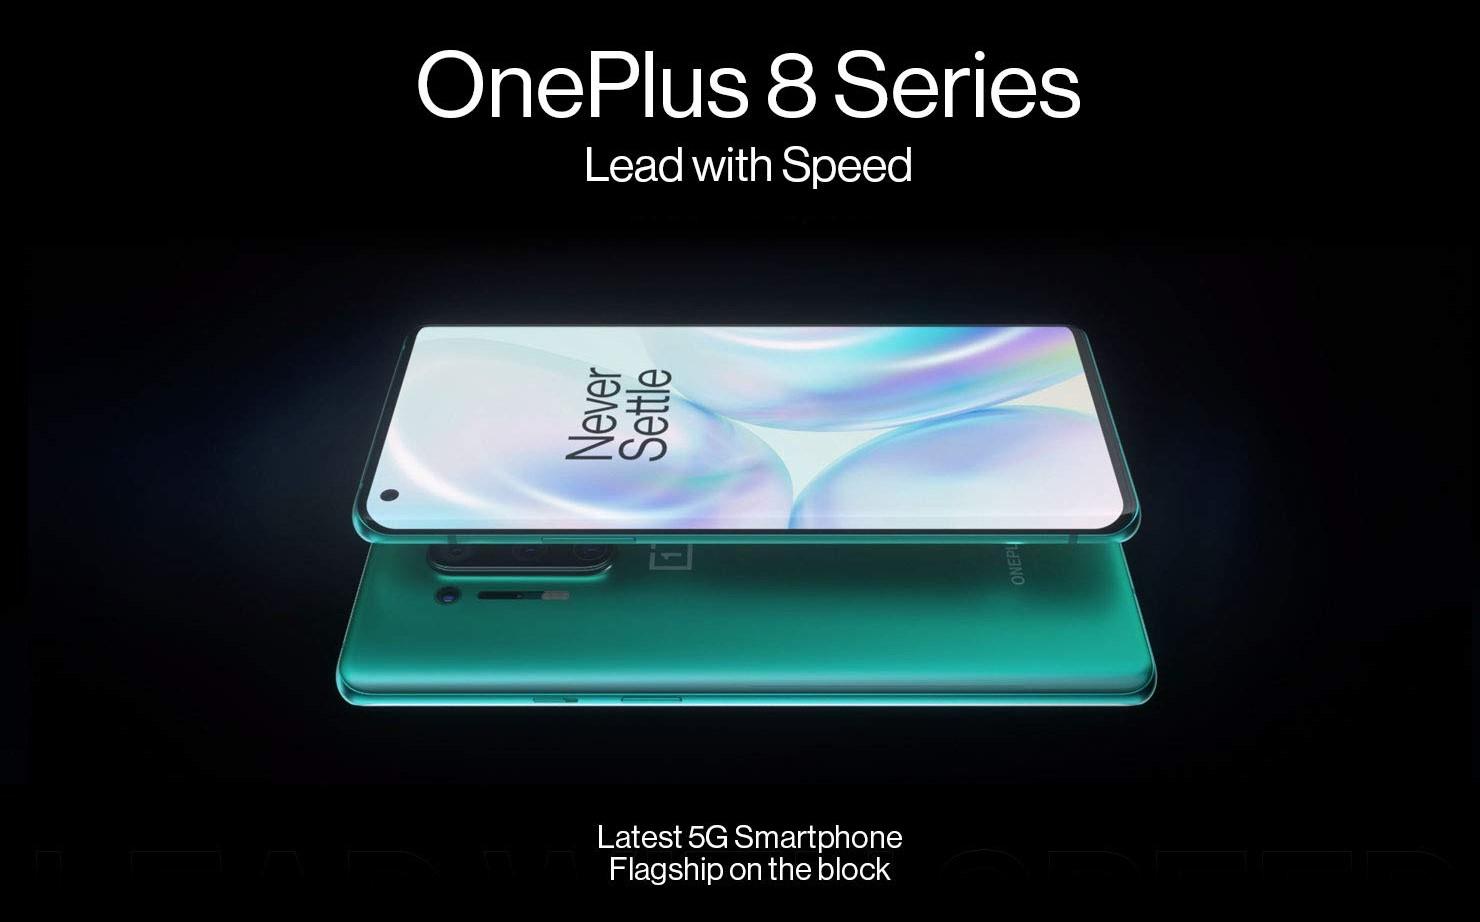 OnePlus 8 Series Prices